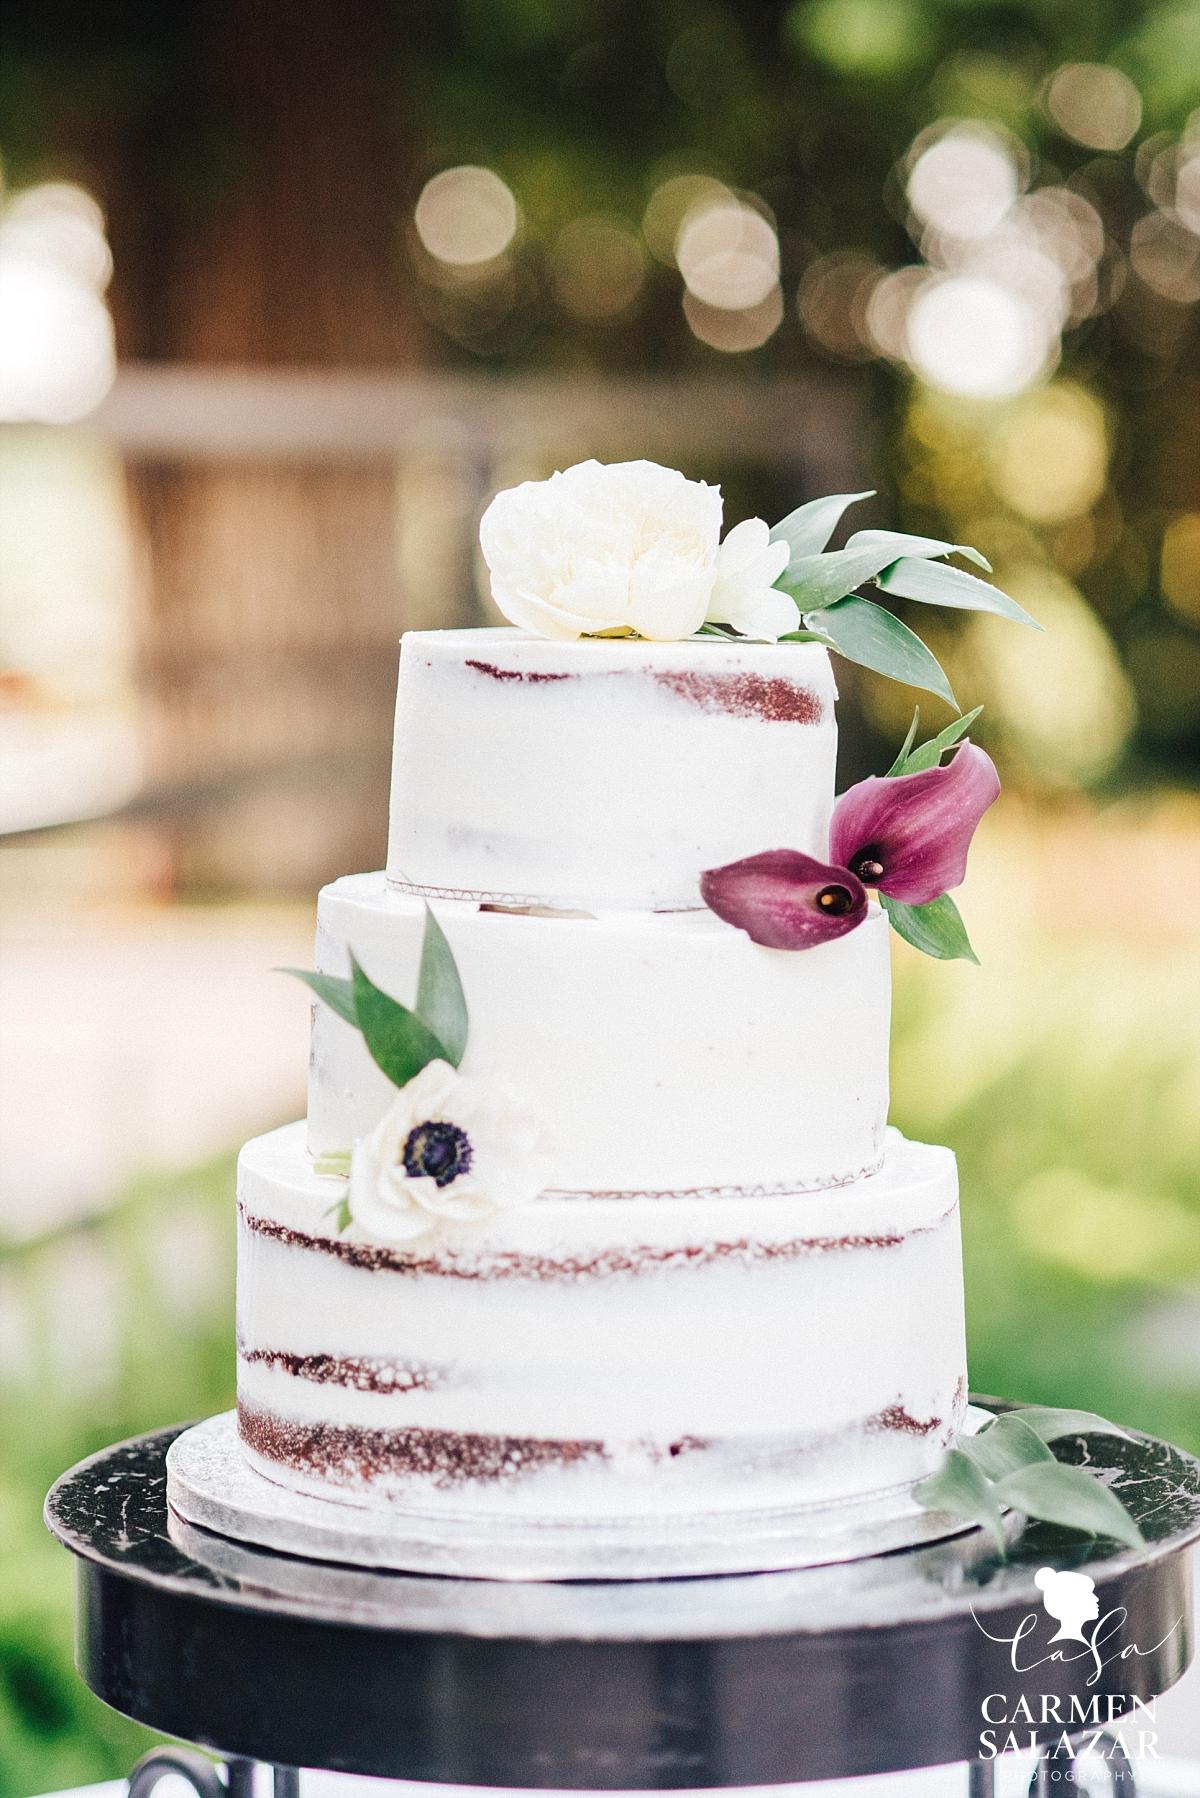 Simple floral wedding cake design - Carmen Salazar